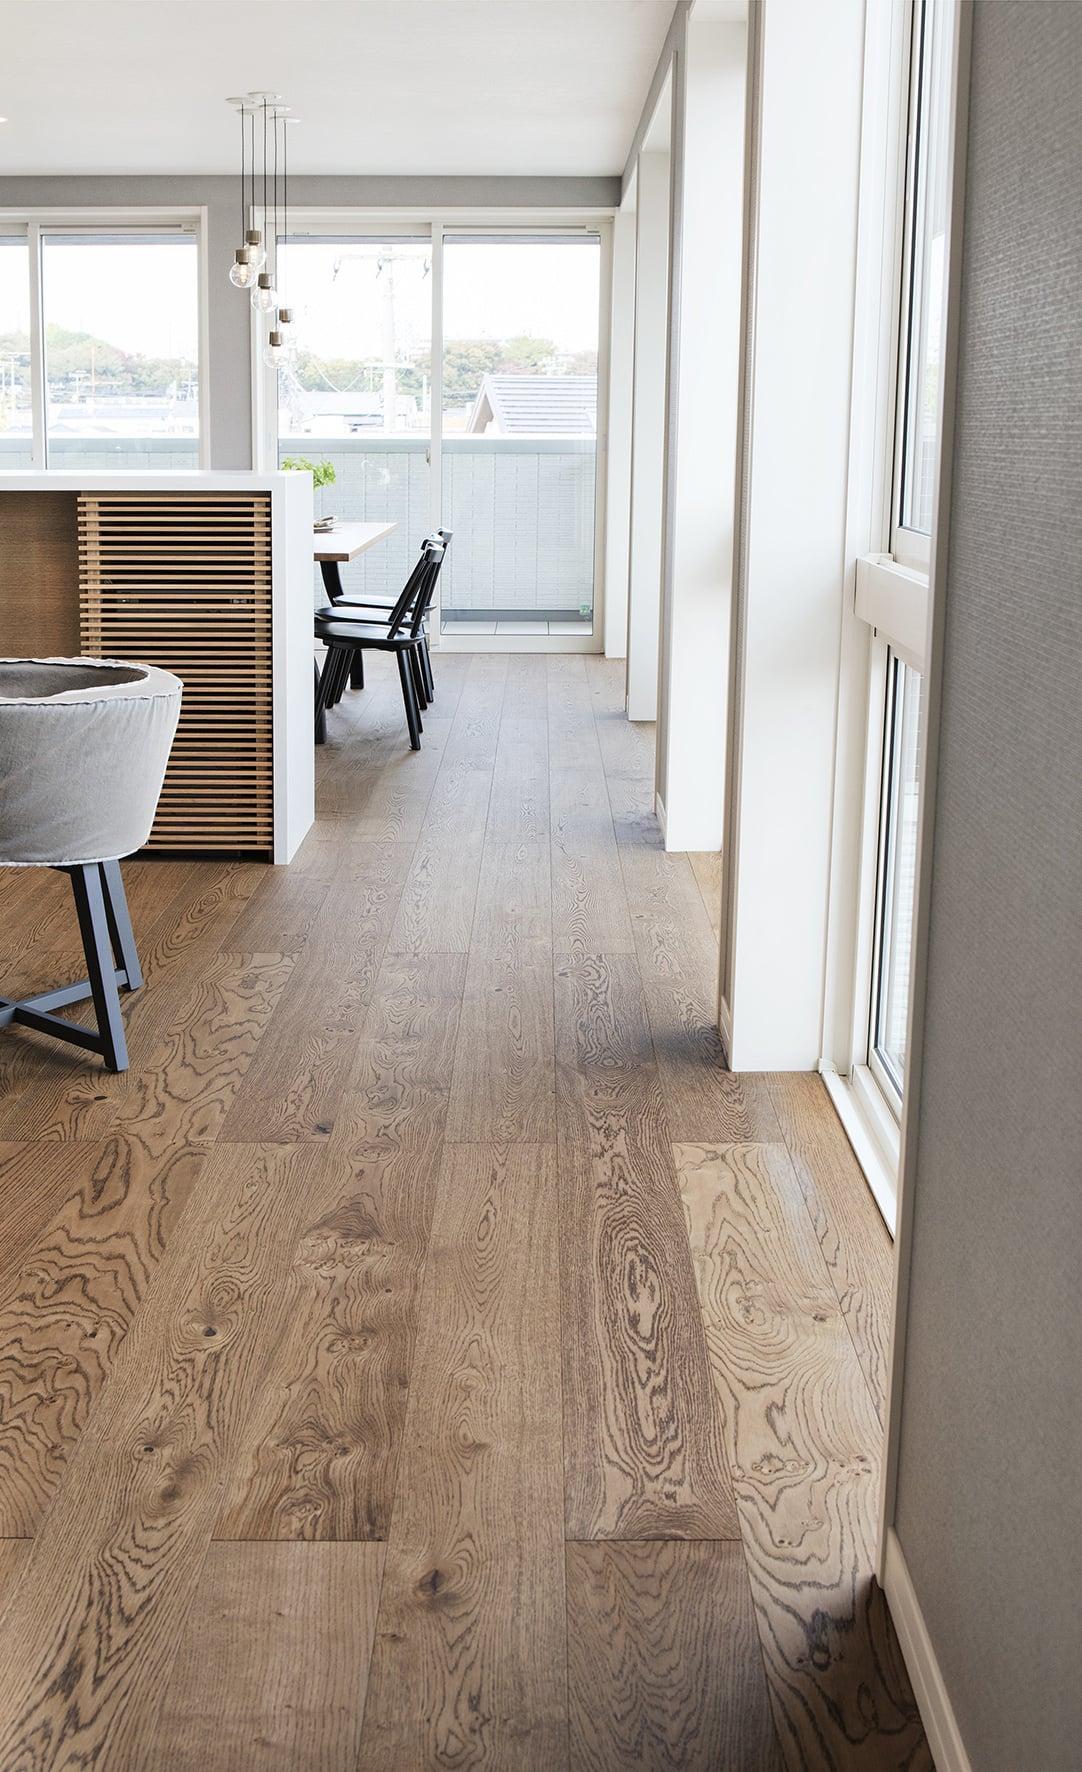 Timberwise parketti puulattia wooden floor parquet Tammi Oak Antique